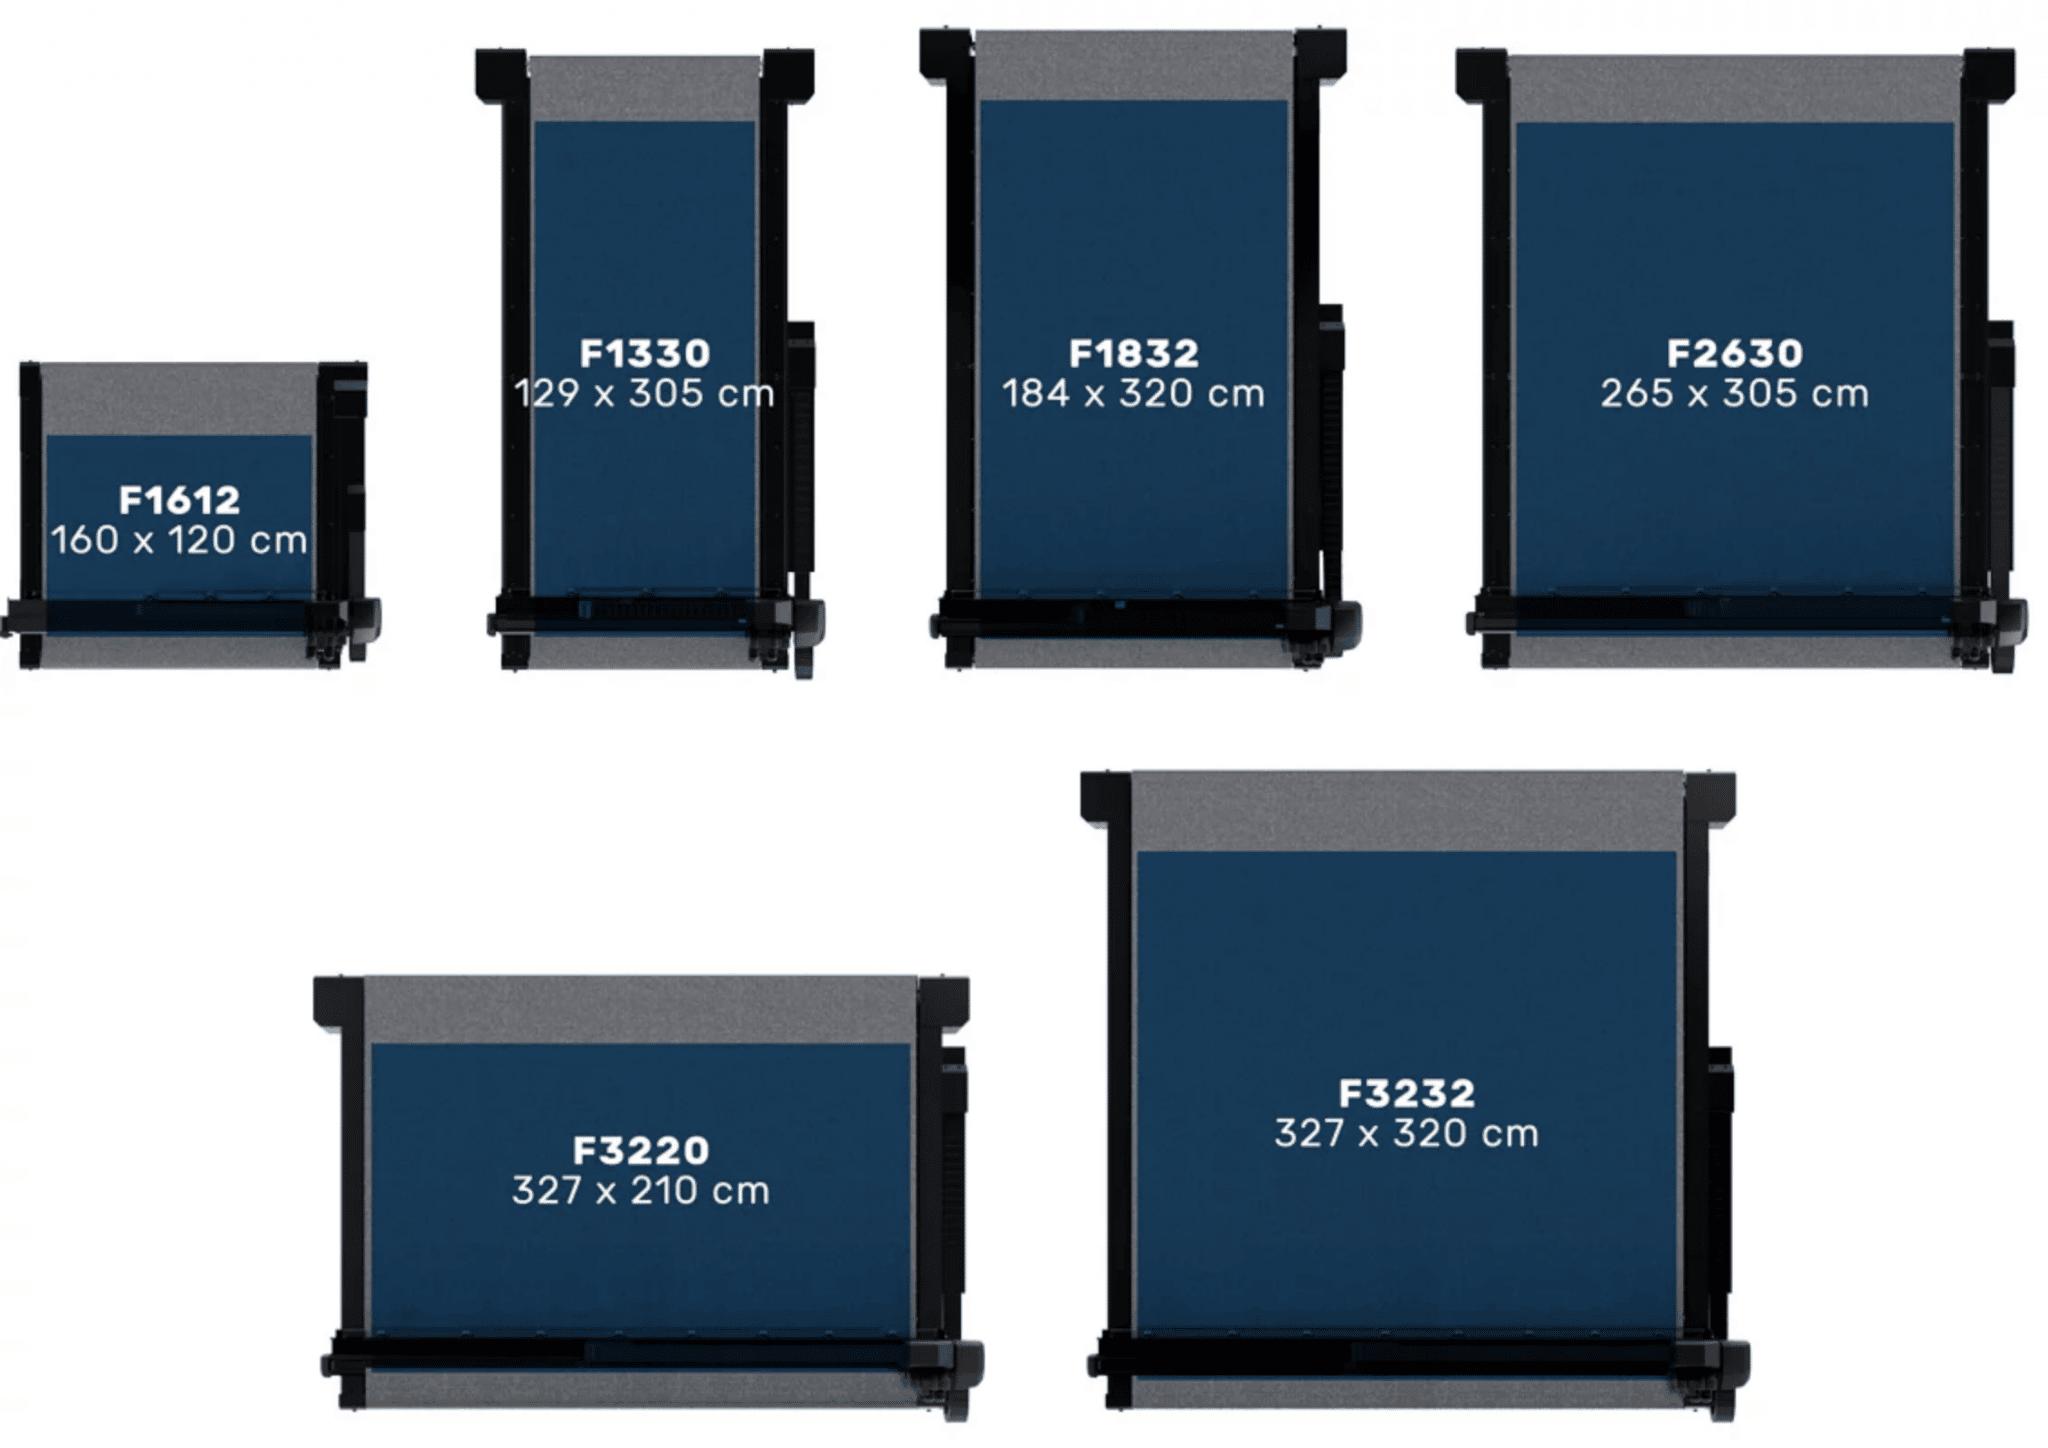 Summa F1612 F1330 F1832 F2630 F3220 og F3232